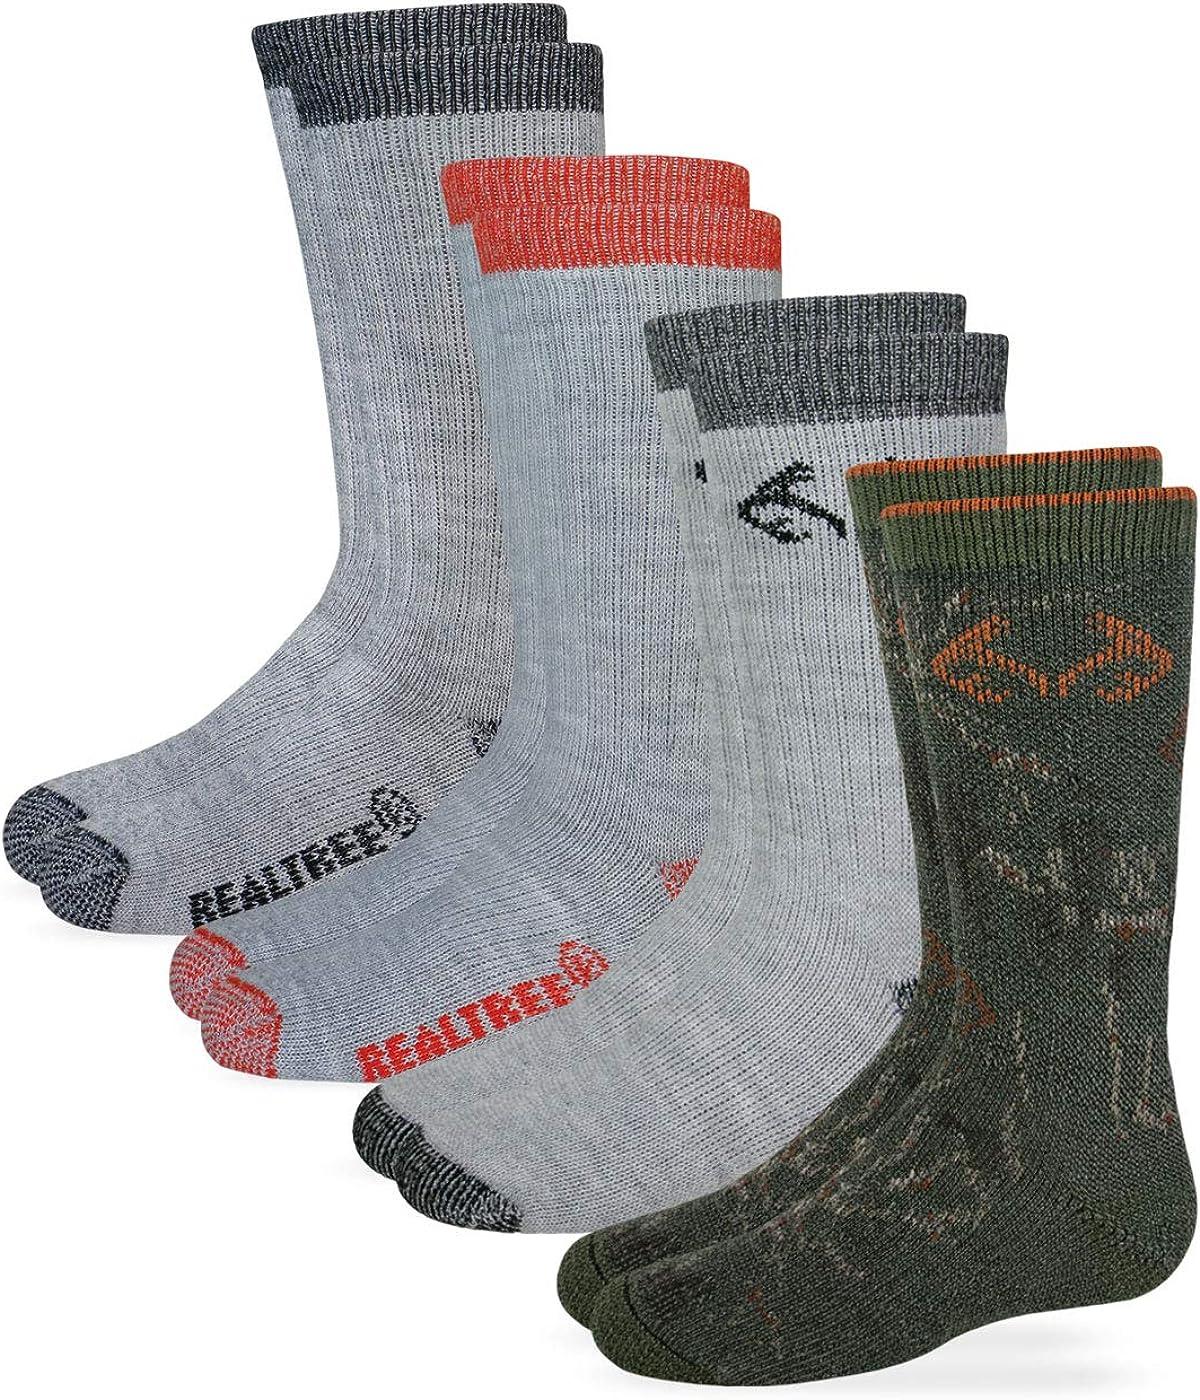 Realtree Boys Boot Sock (4- Pack) Multi, Small